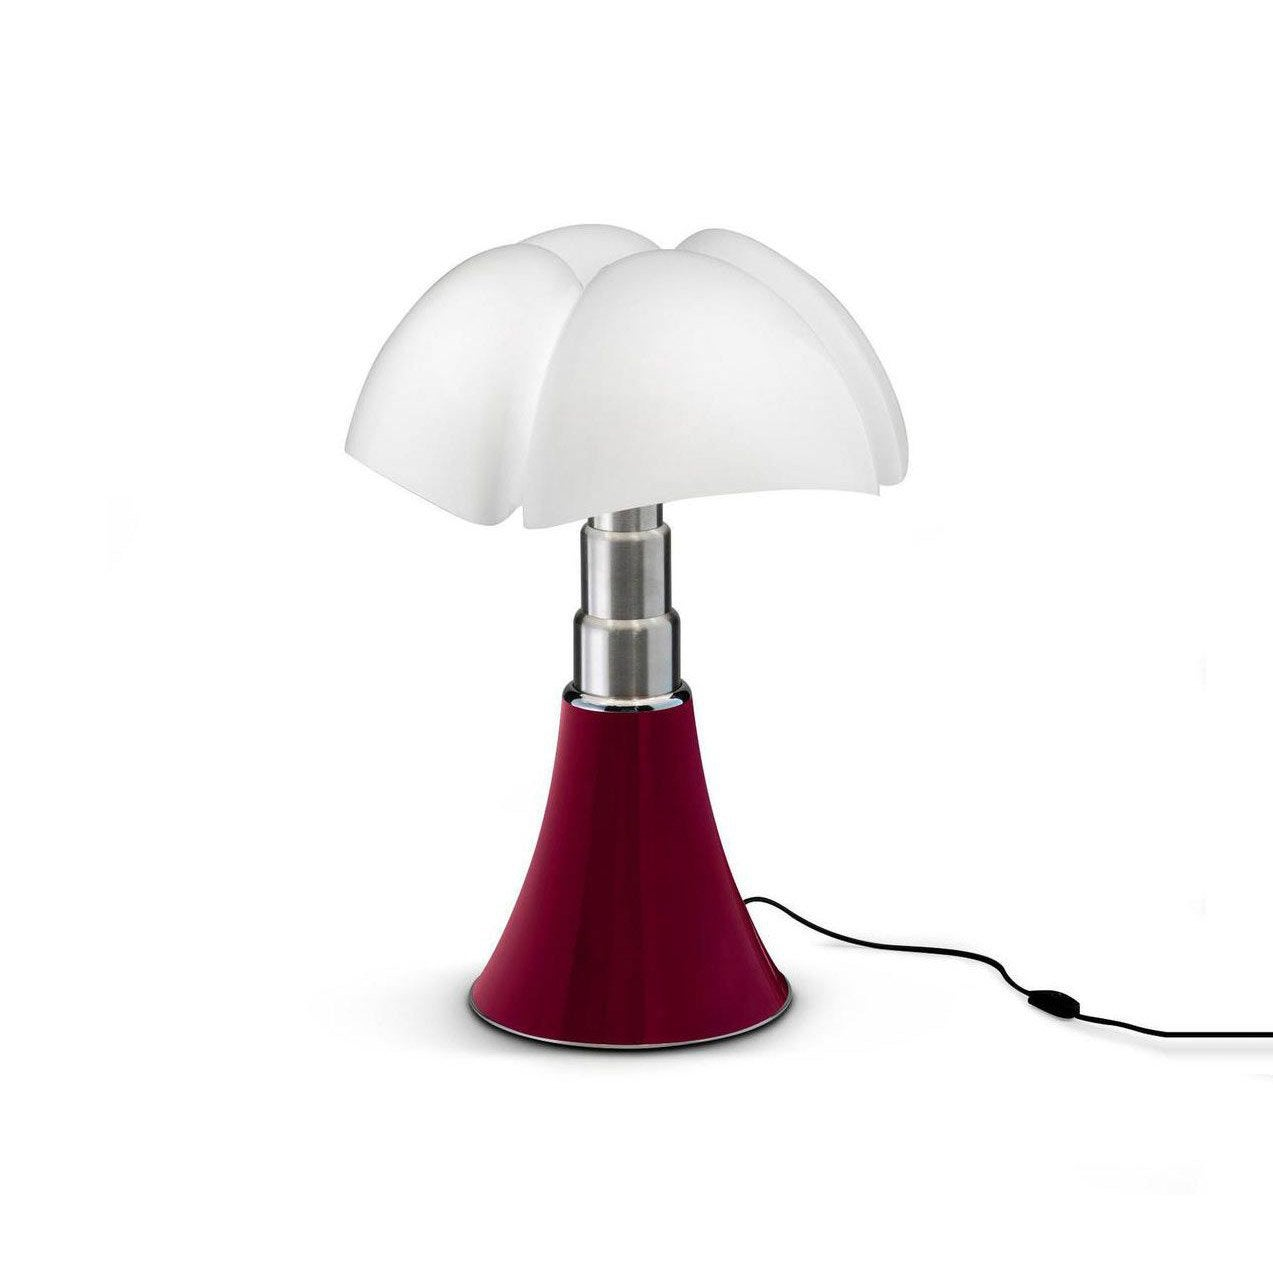 Lampe, design, métal, MARTINELLI LUCE Mini pipistrello rouge